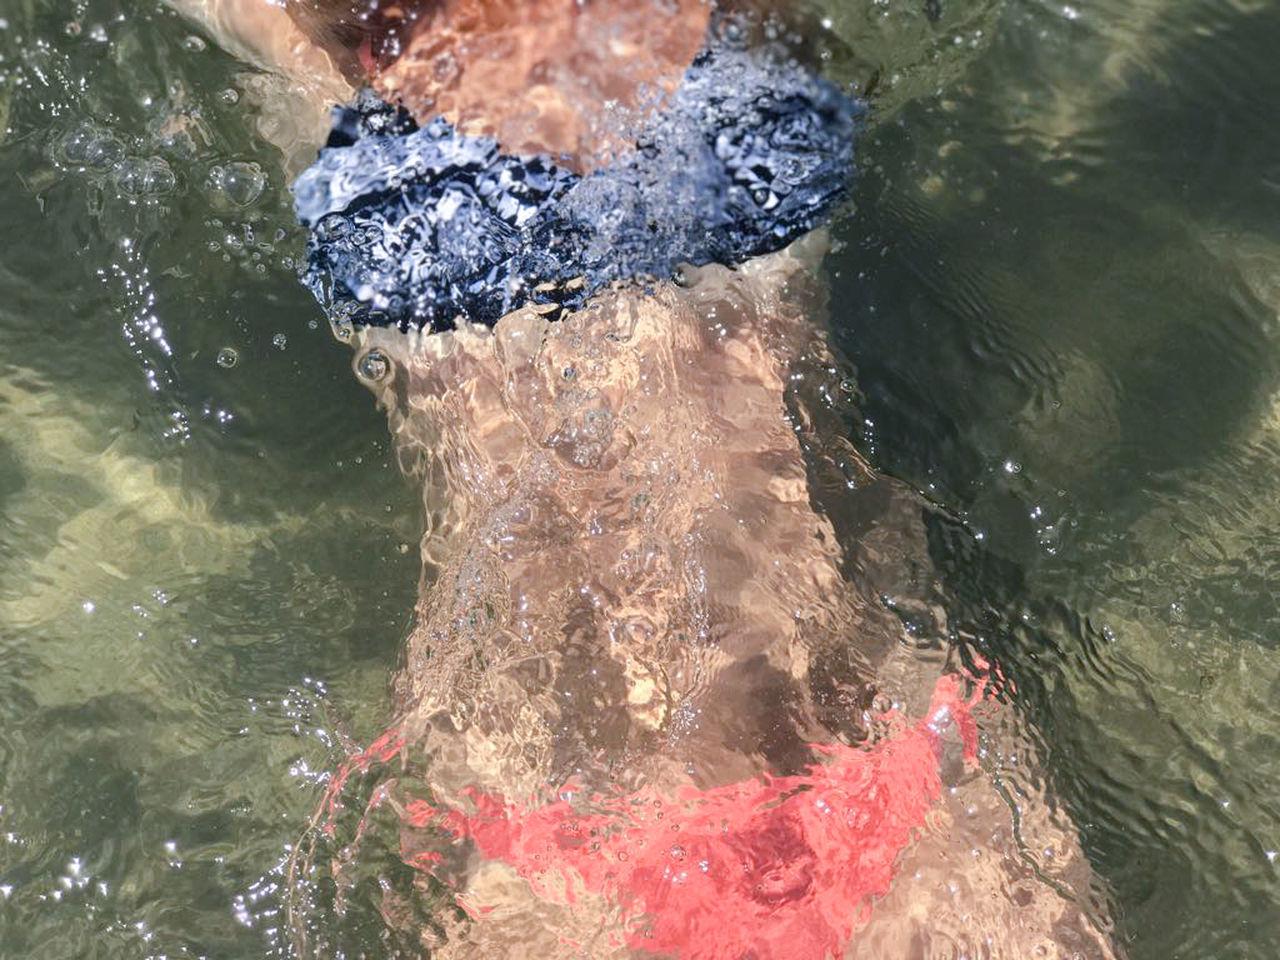 Beachphotography Bikini Girl Holidays Lifestyles One Person Outdoors People Splashing Swimming Vacation Water